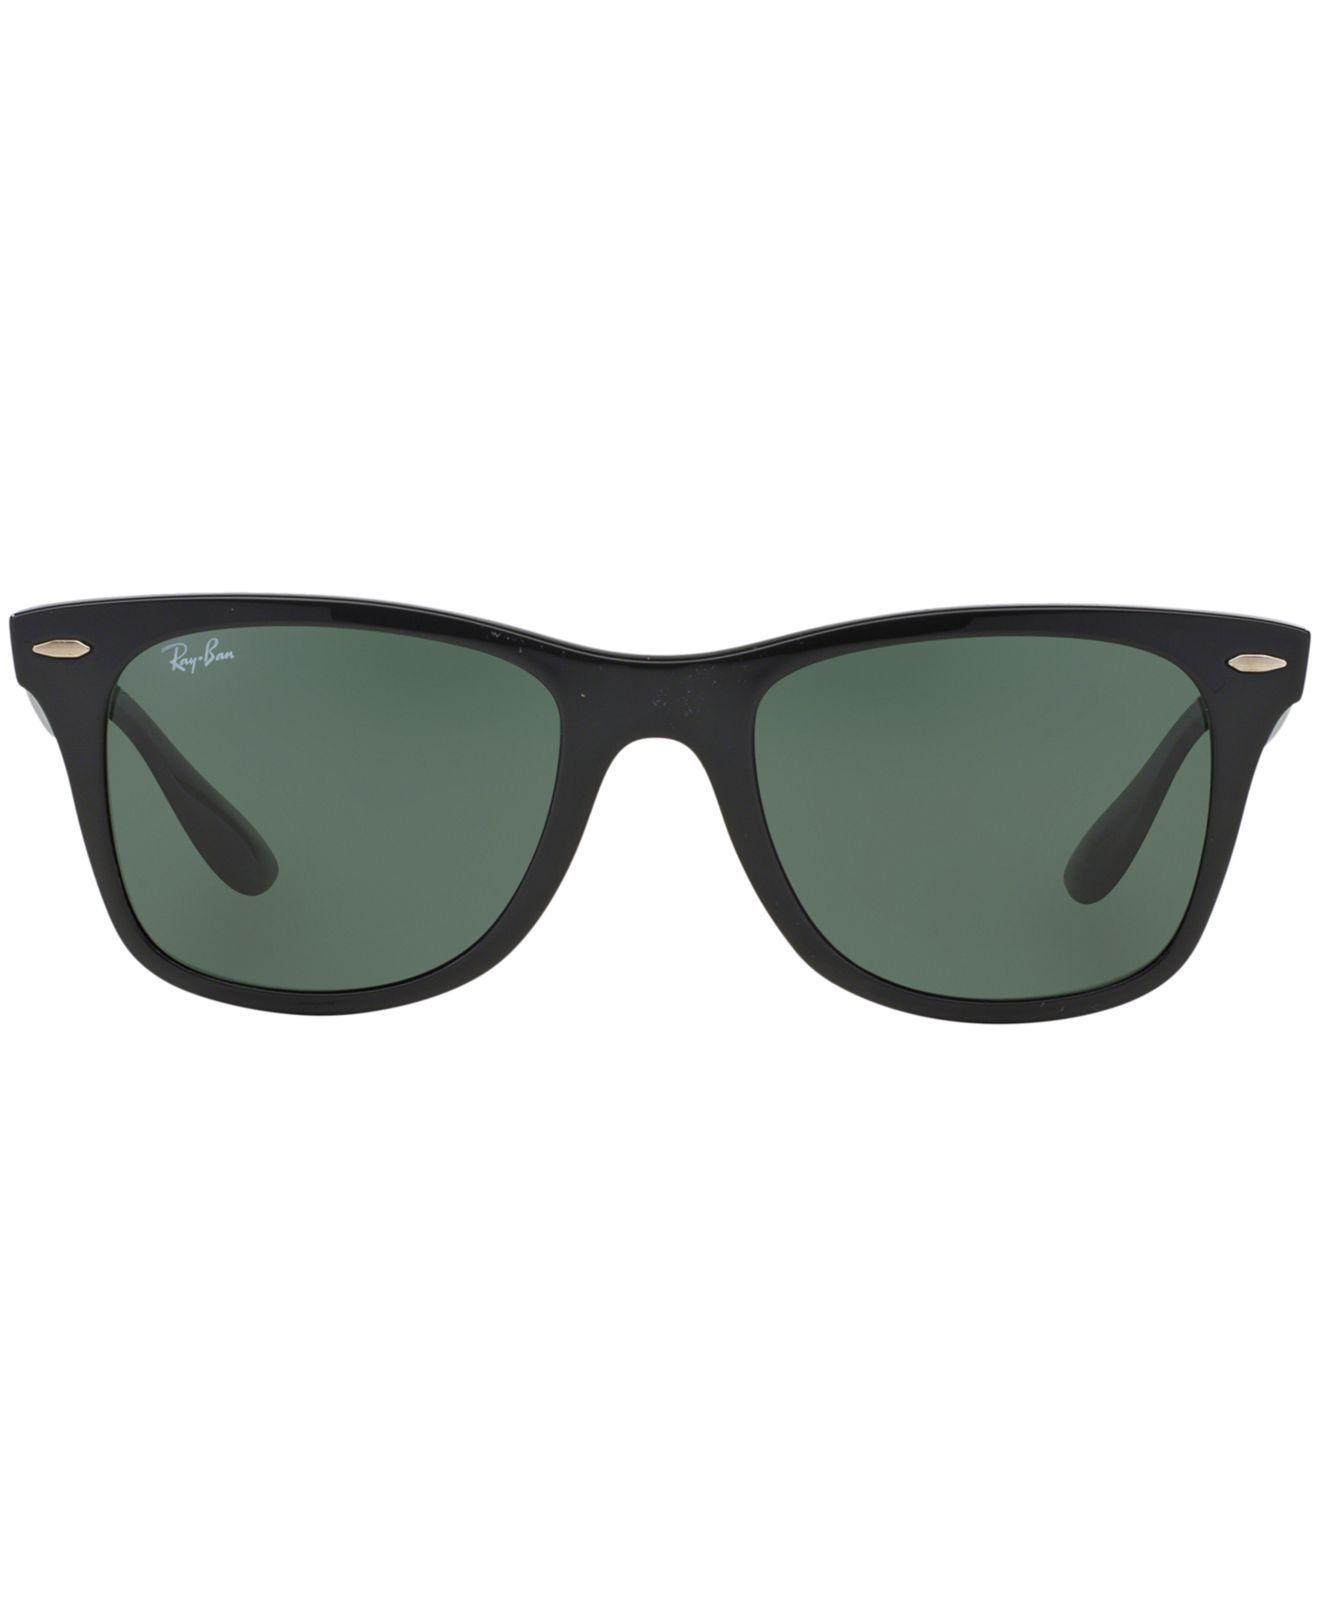 9b0c8a8b27c ... discount lyst ray ban sunglasses rb4195 52 wayfarer liteforce in black  for men b33a8 de554